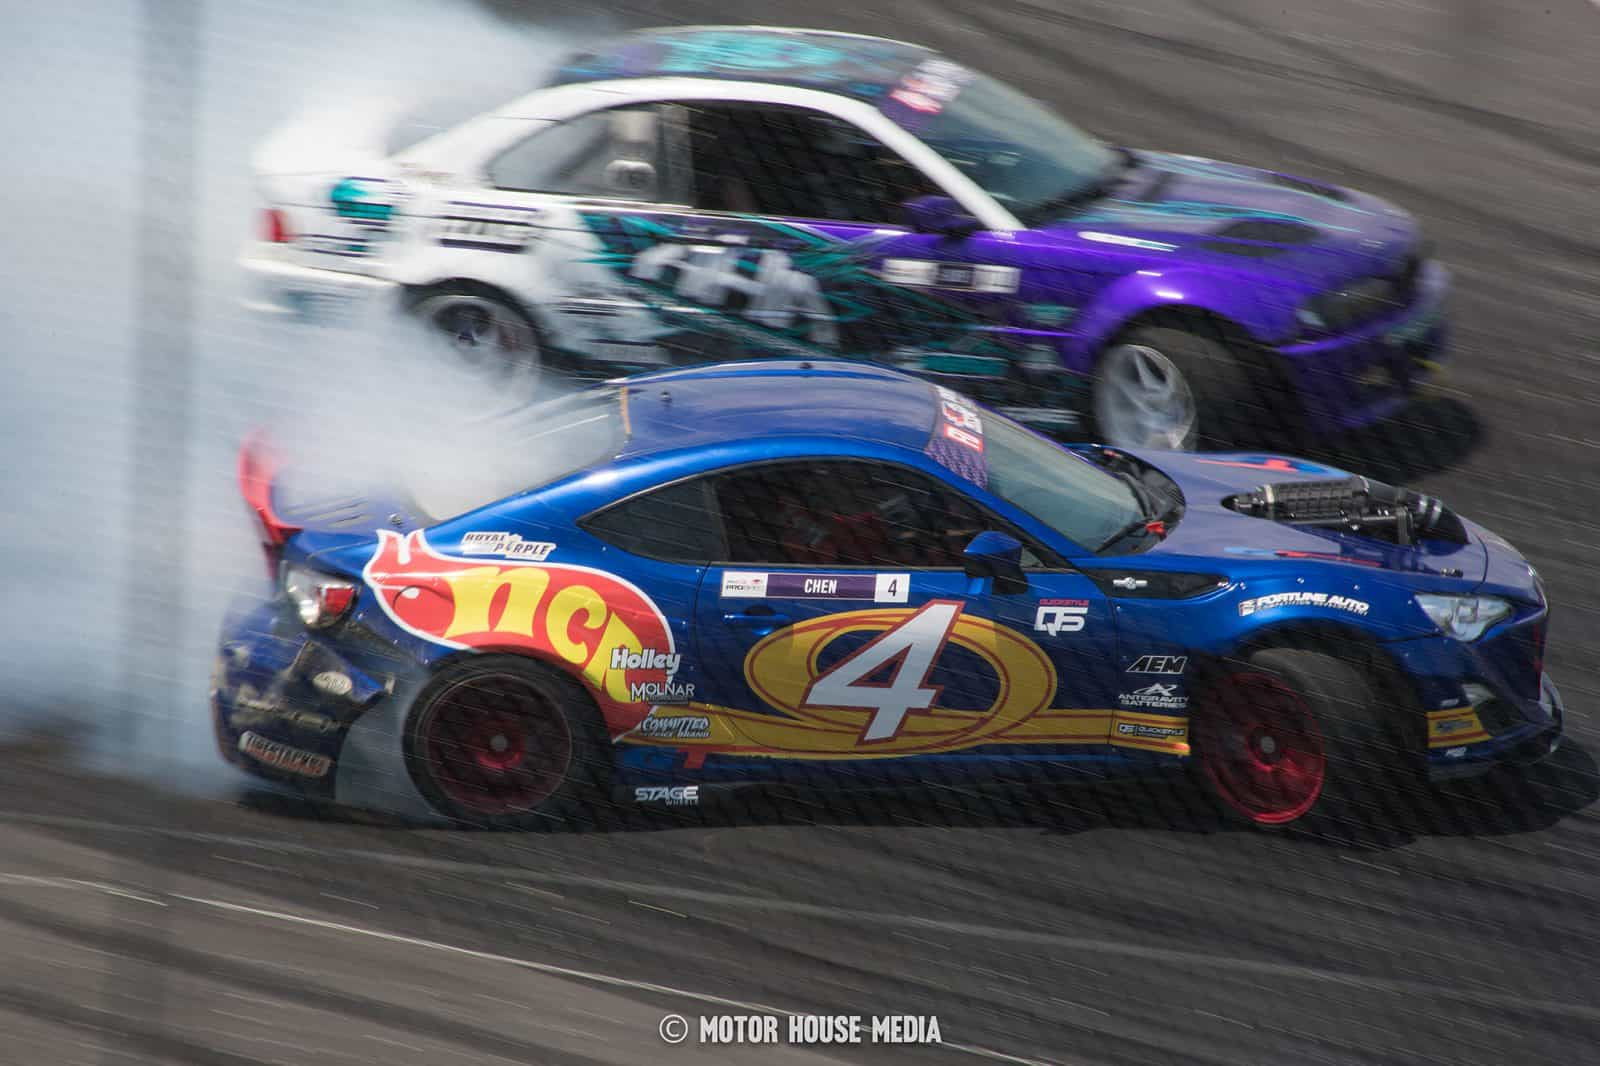 Nate Chen in his Formula Drift car